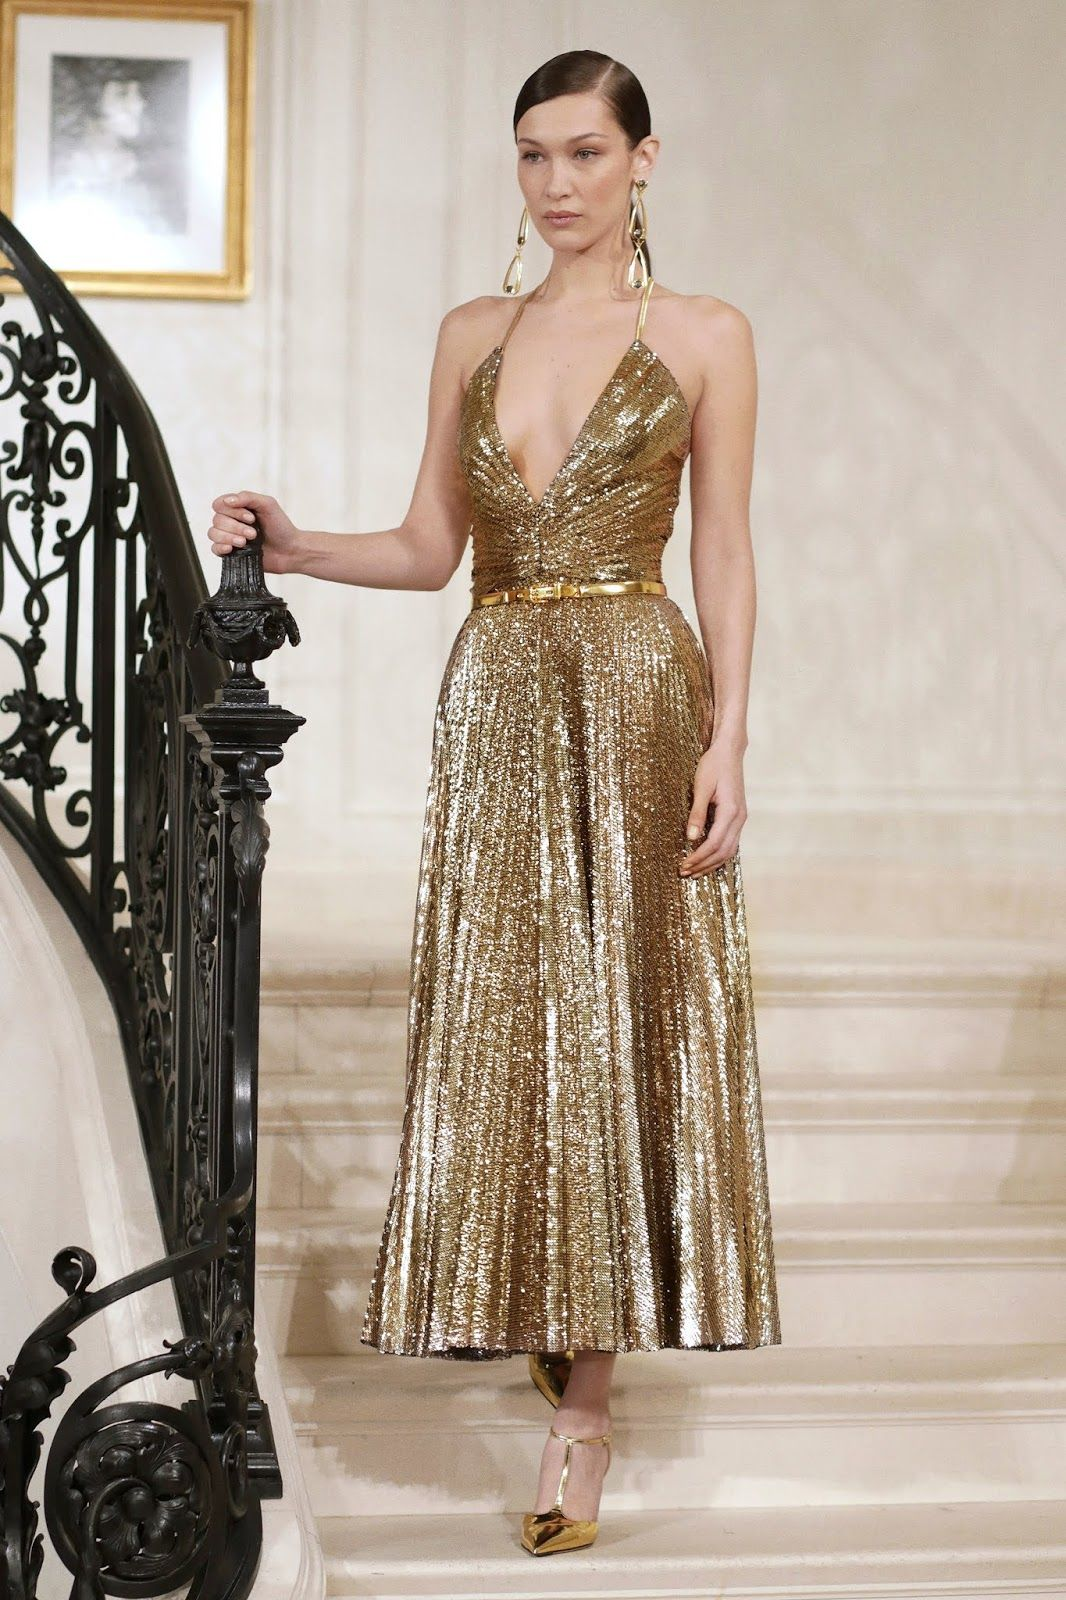 Ralph Lauren Spring 18 RTW - In love with  Golden dress